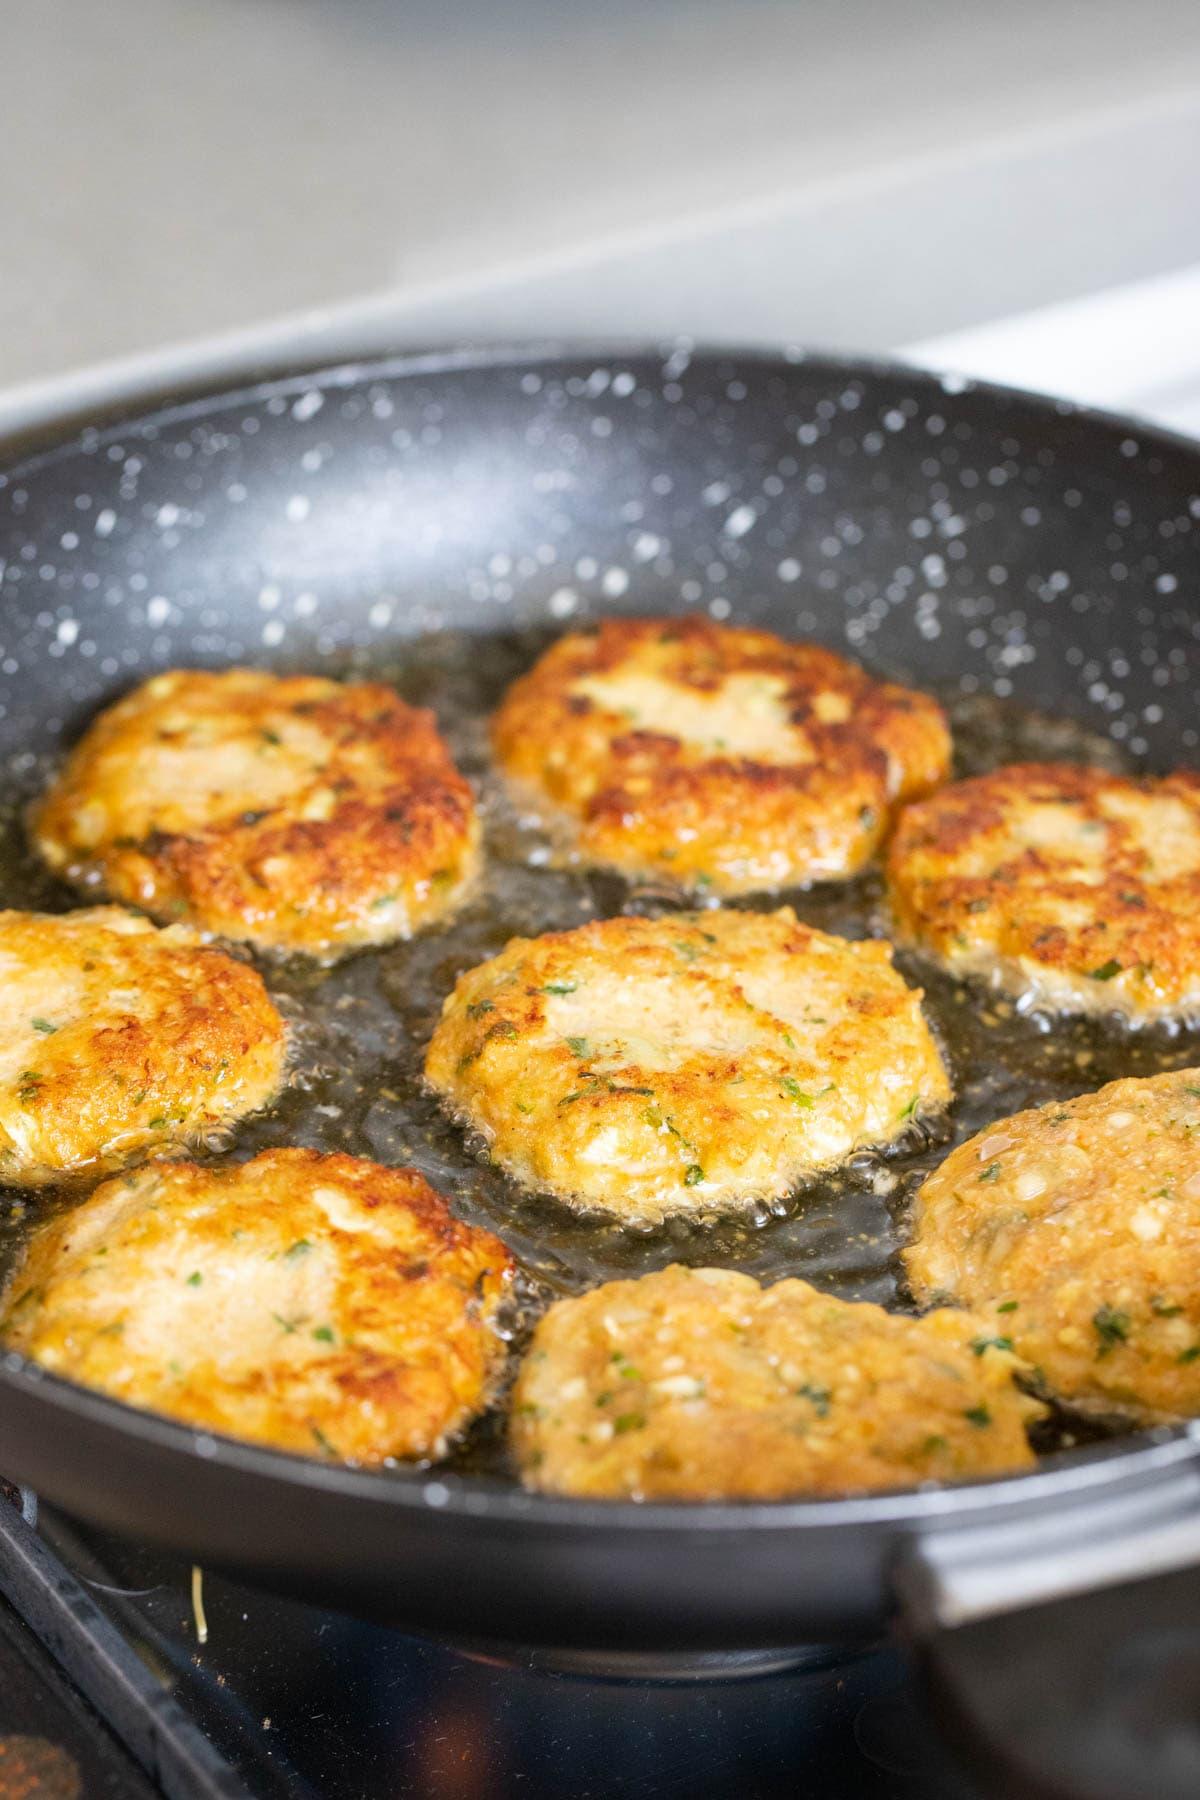 Frying the meatballs.